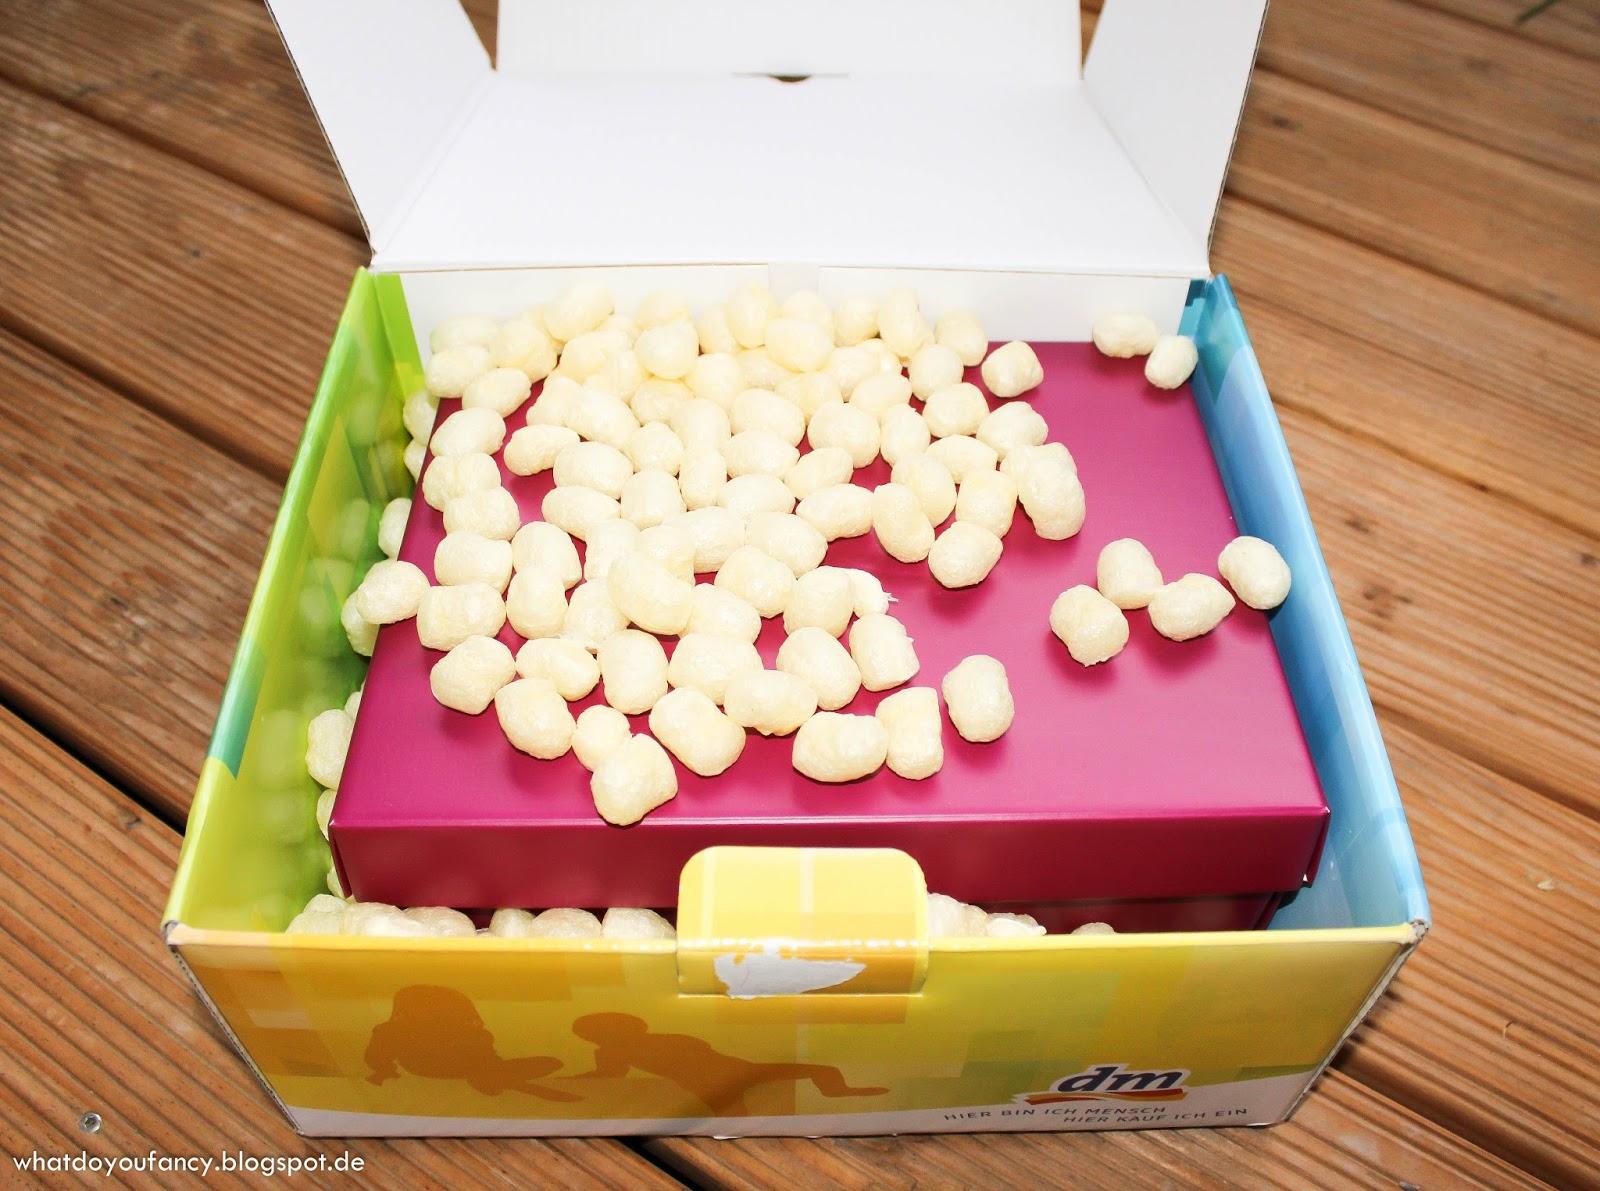 dm Lieblinge Box August 2013 unwrapped